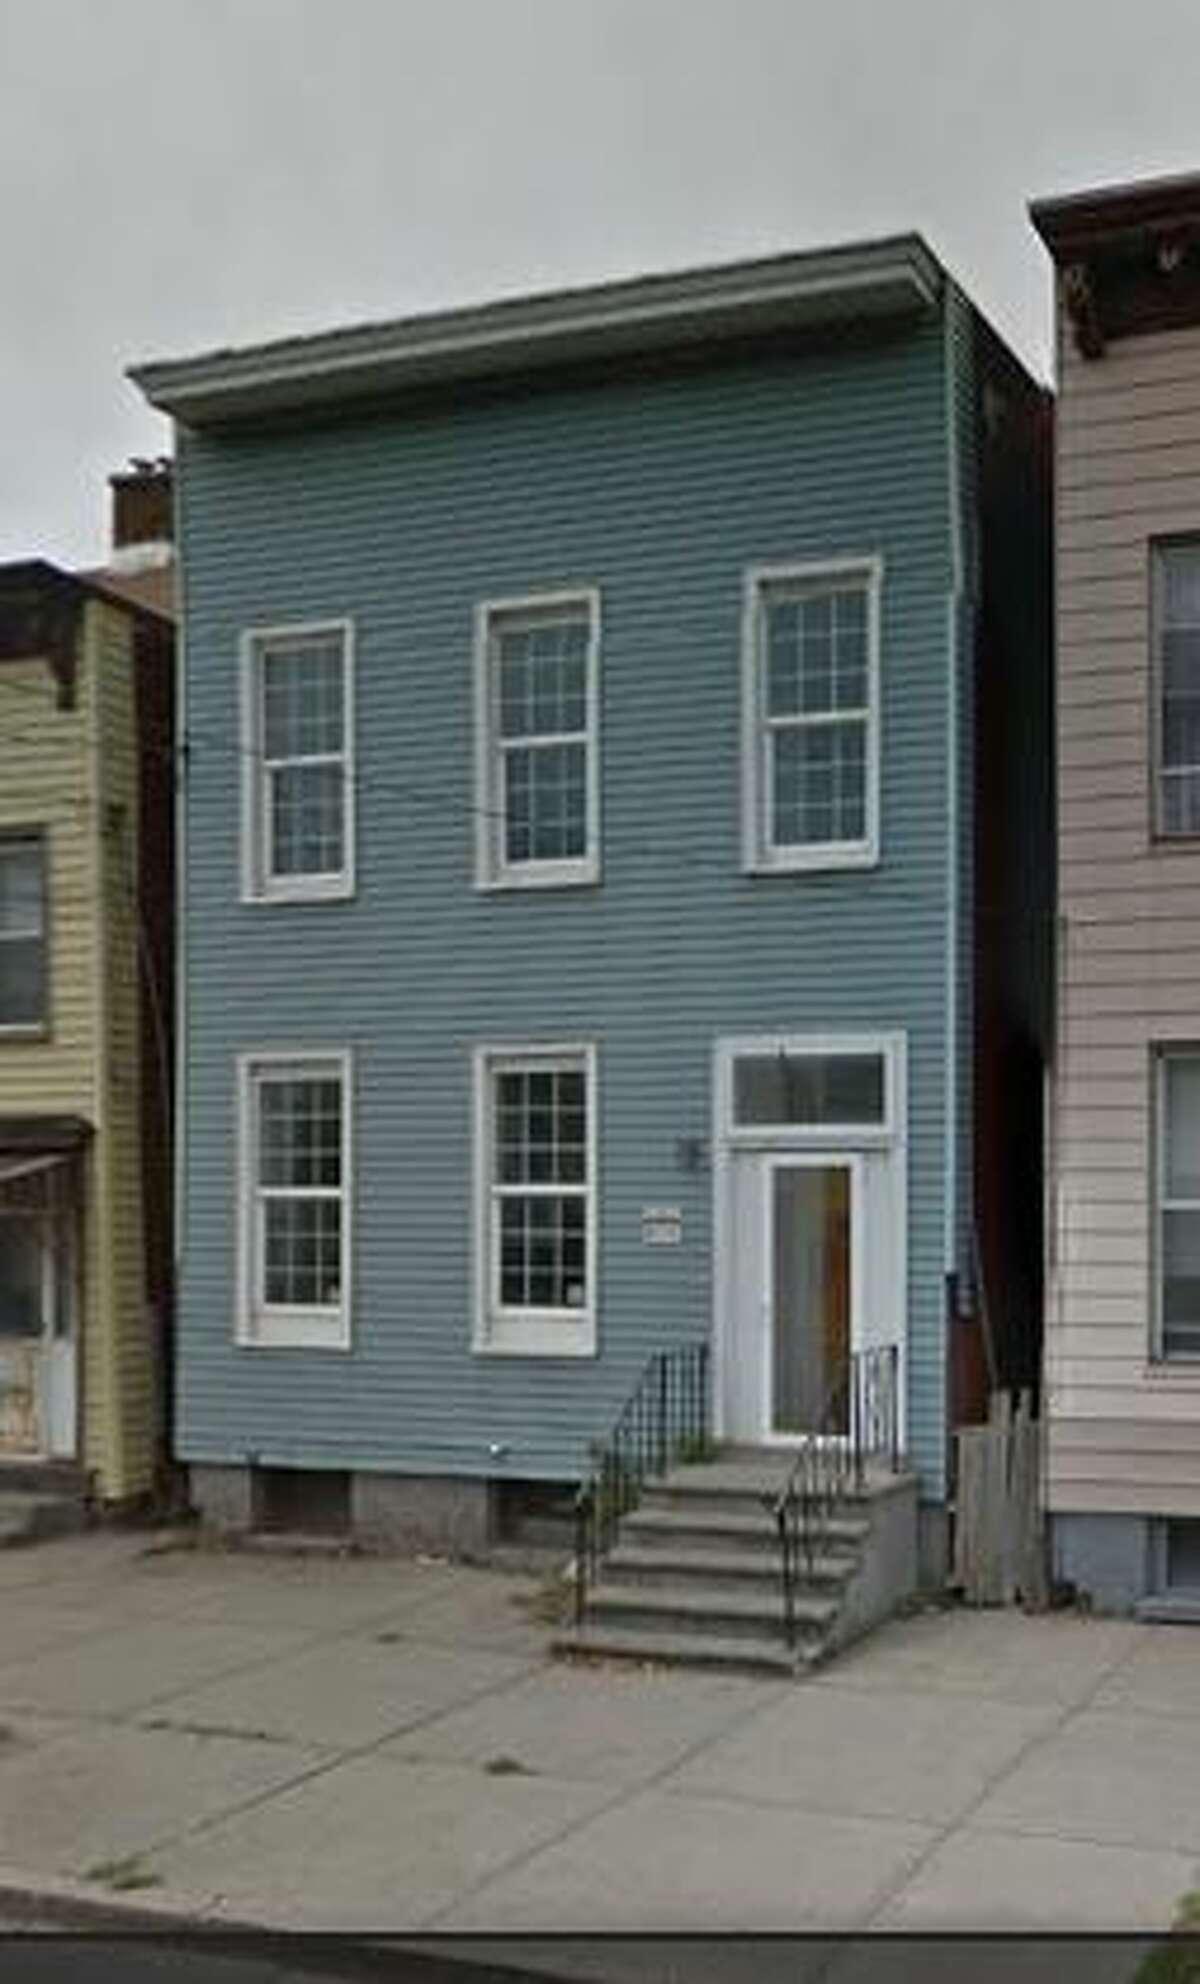 41 Ontario St., Albany, $25,000 (Google Maps)